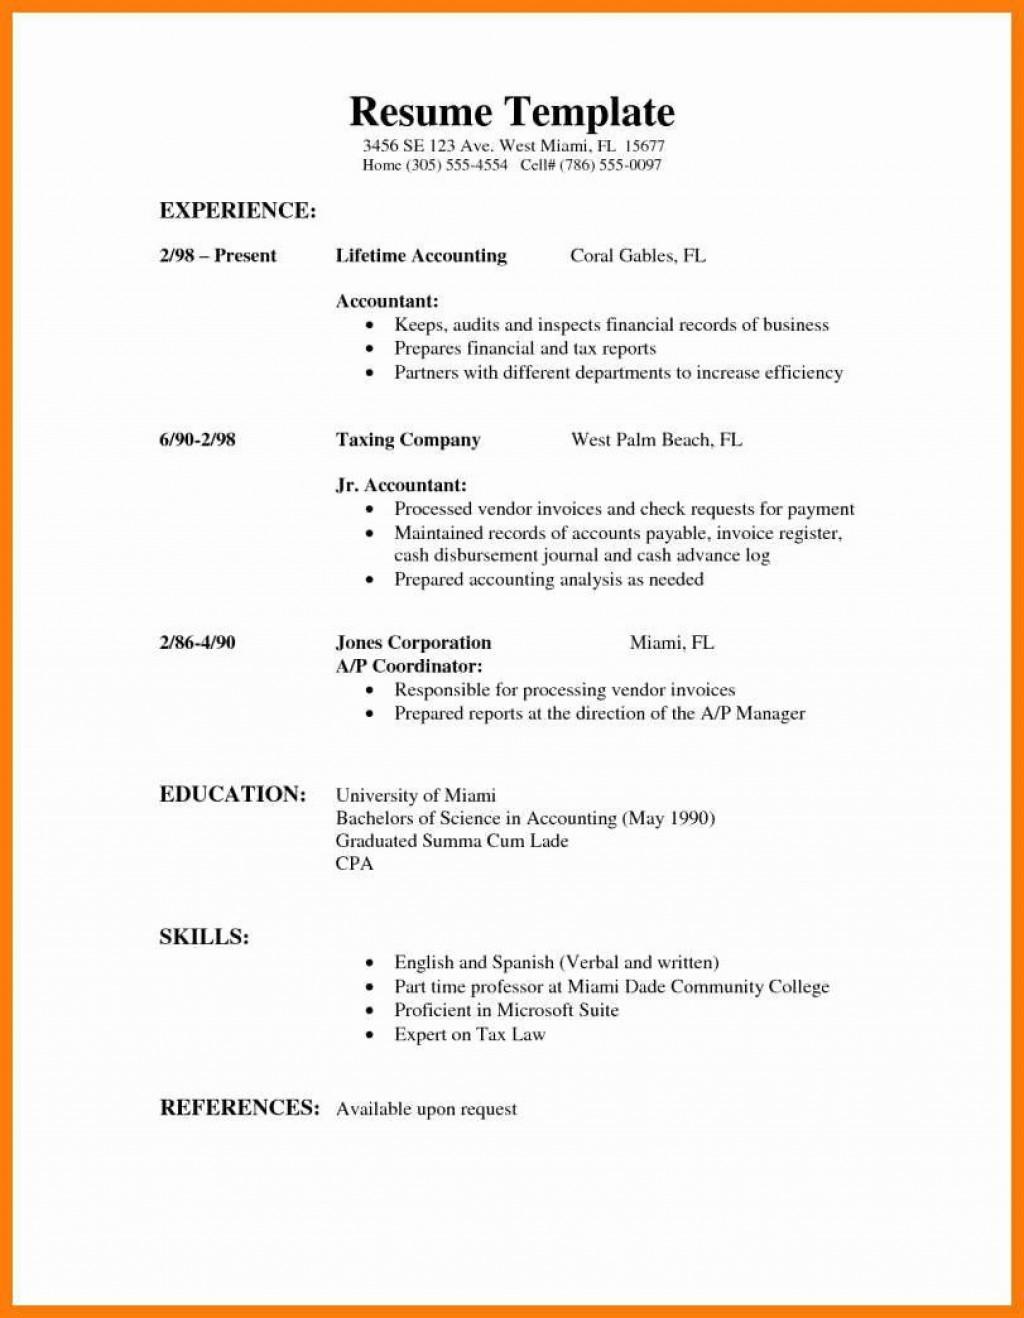 000 Impressive Part Time Job Resume Template Photo  Student Summary ExampleLarge